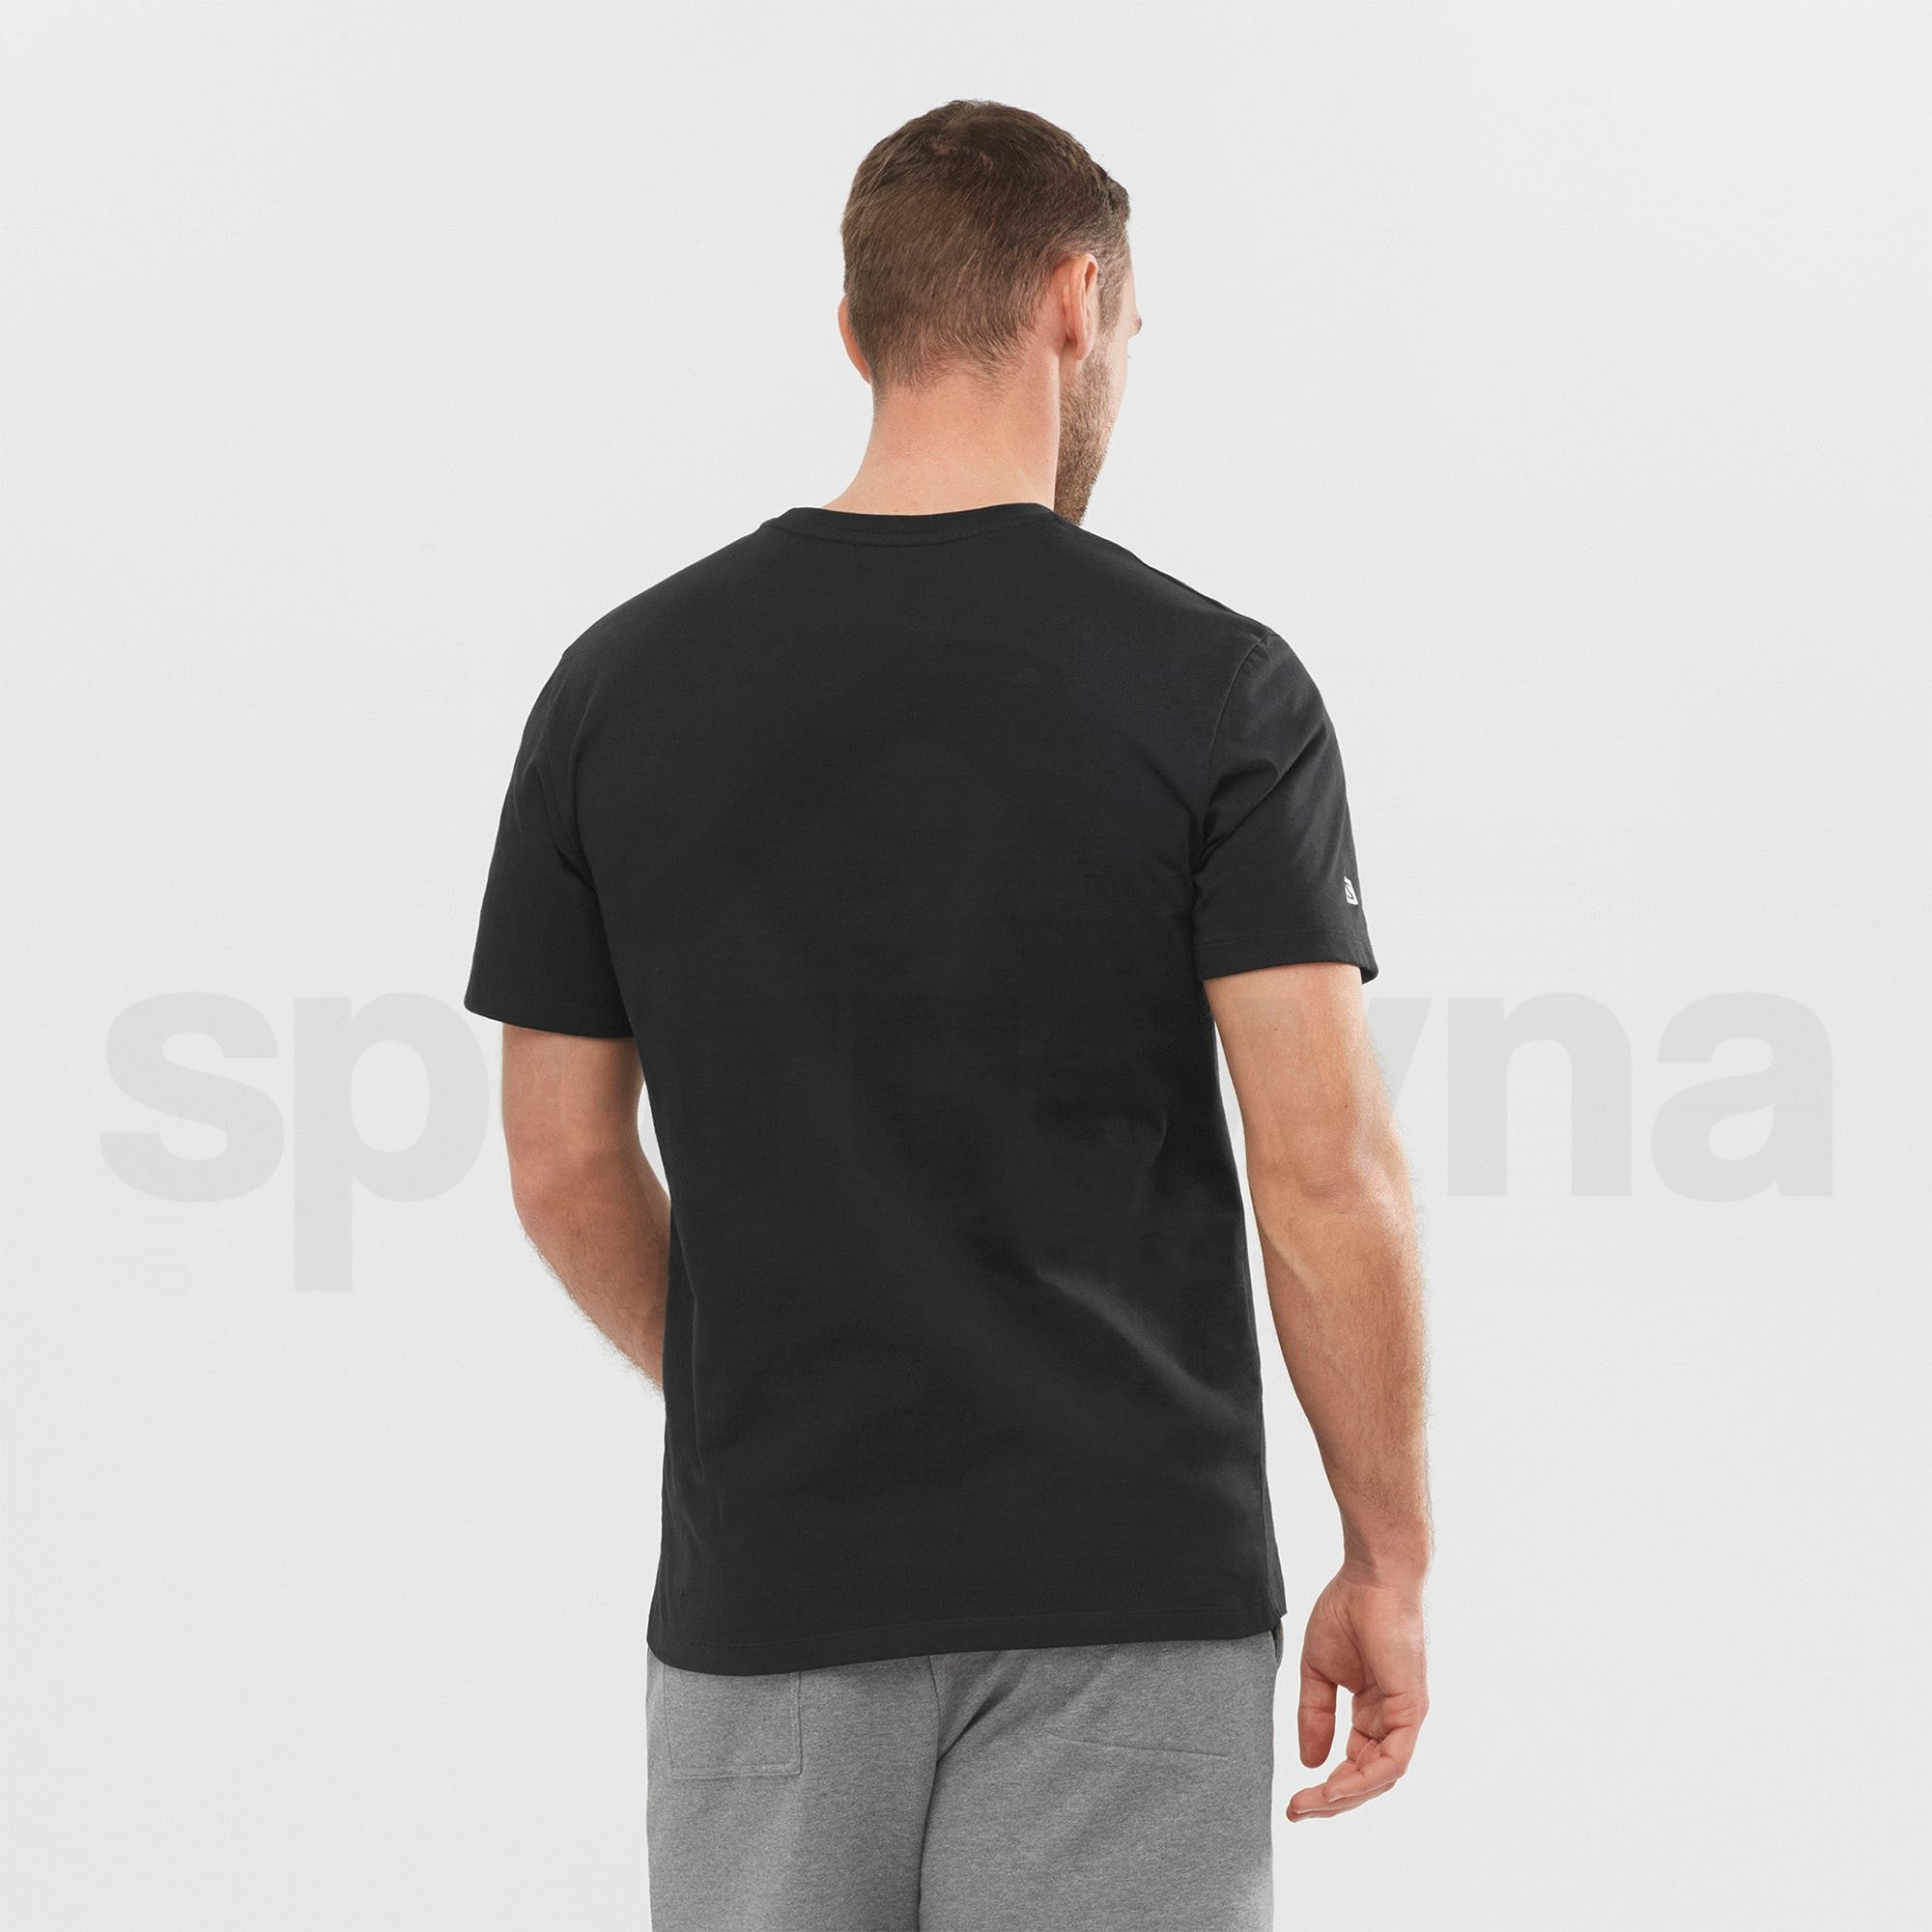 Tričko Salomon OUTLIFE GRAPHIC DISRUPTED M - černá